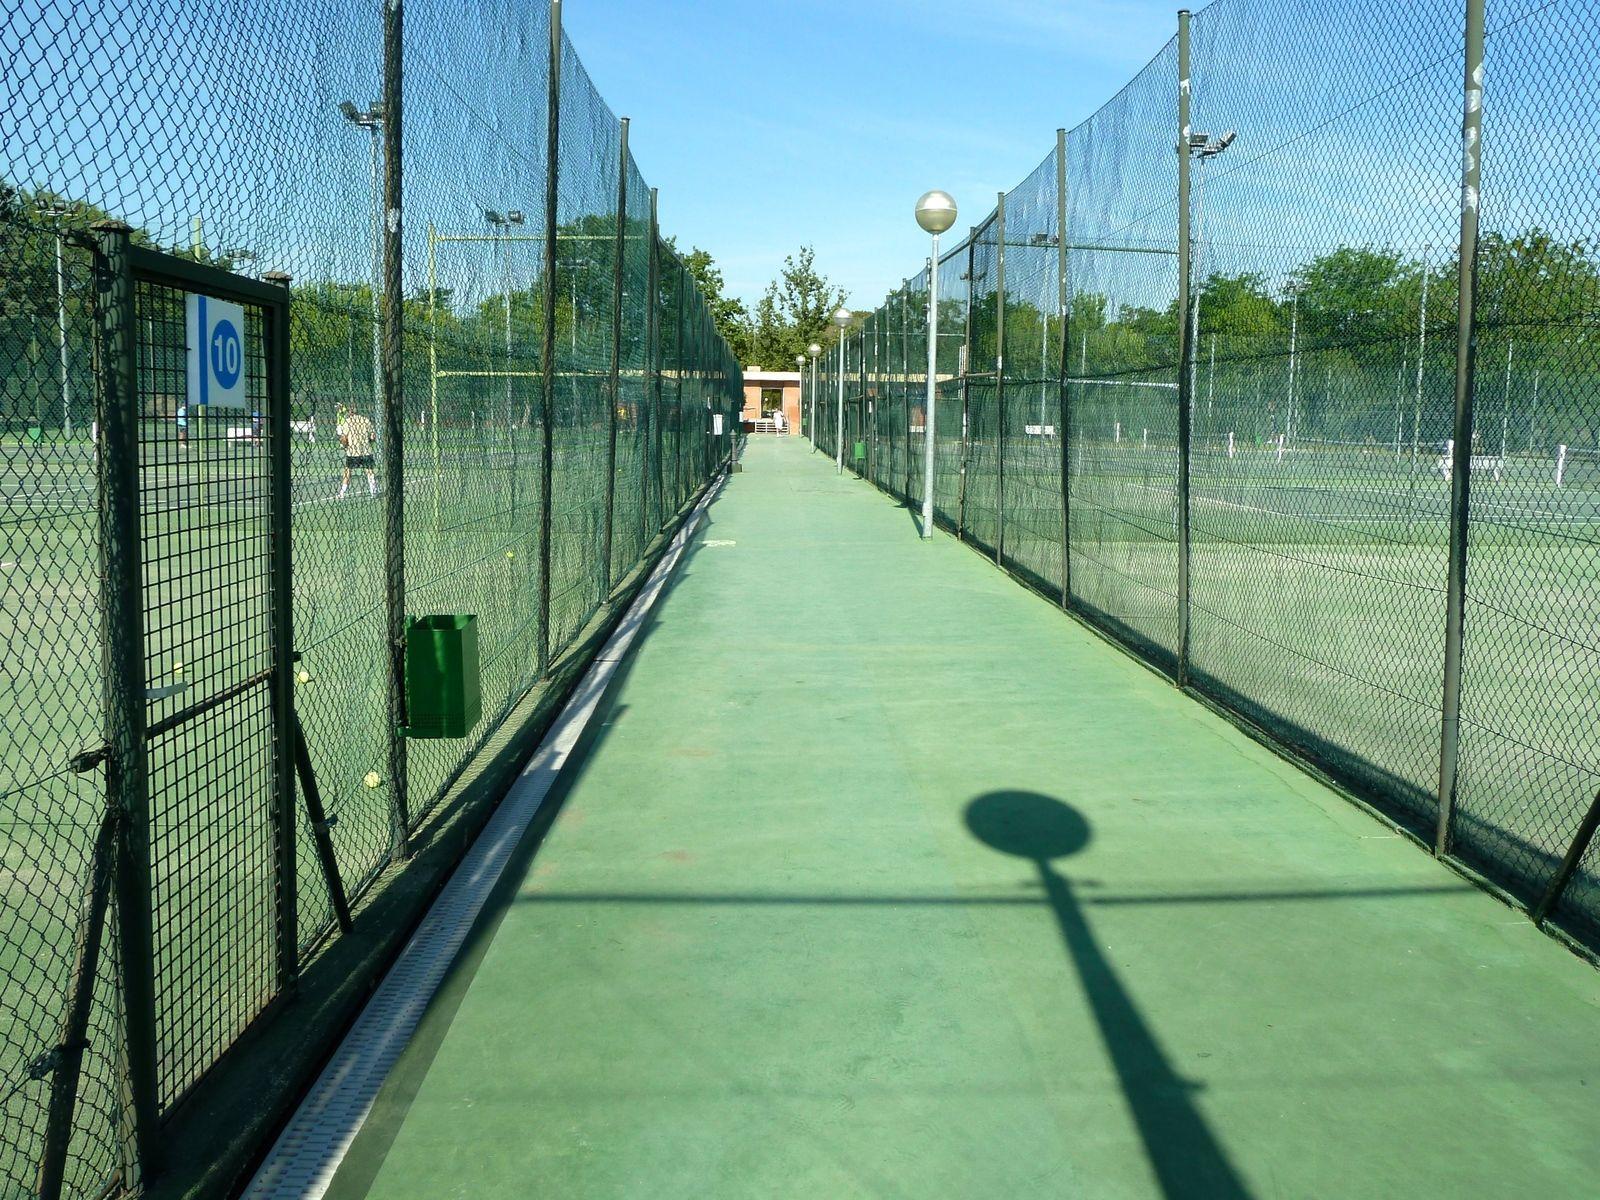 Casa de campo tennis courts madrid spain tennis tourist - Casa de campo park ...